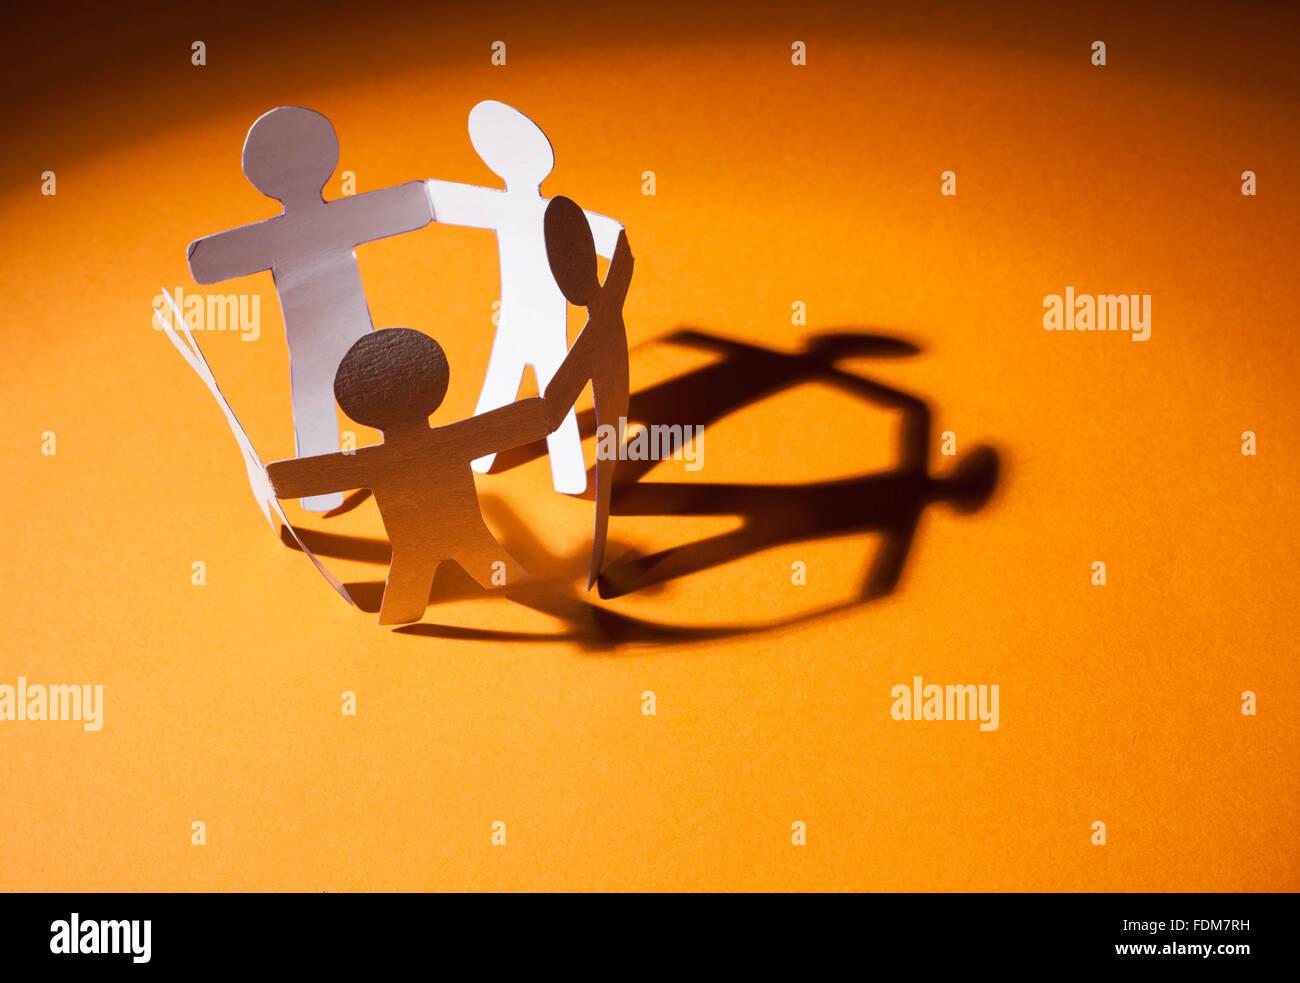 Paper team - Stock Image